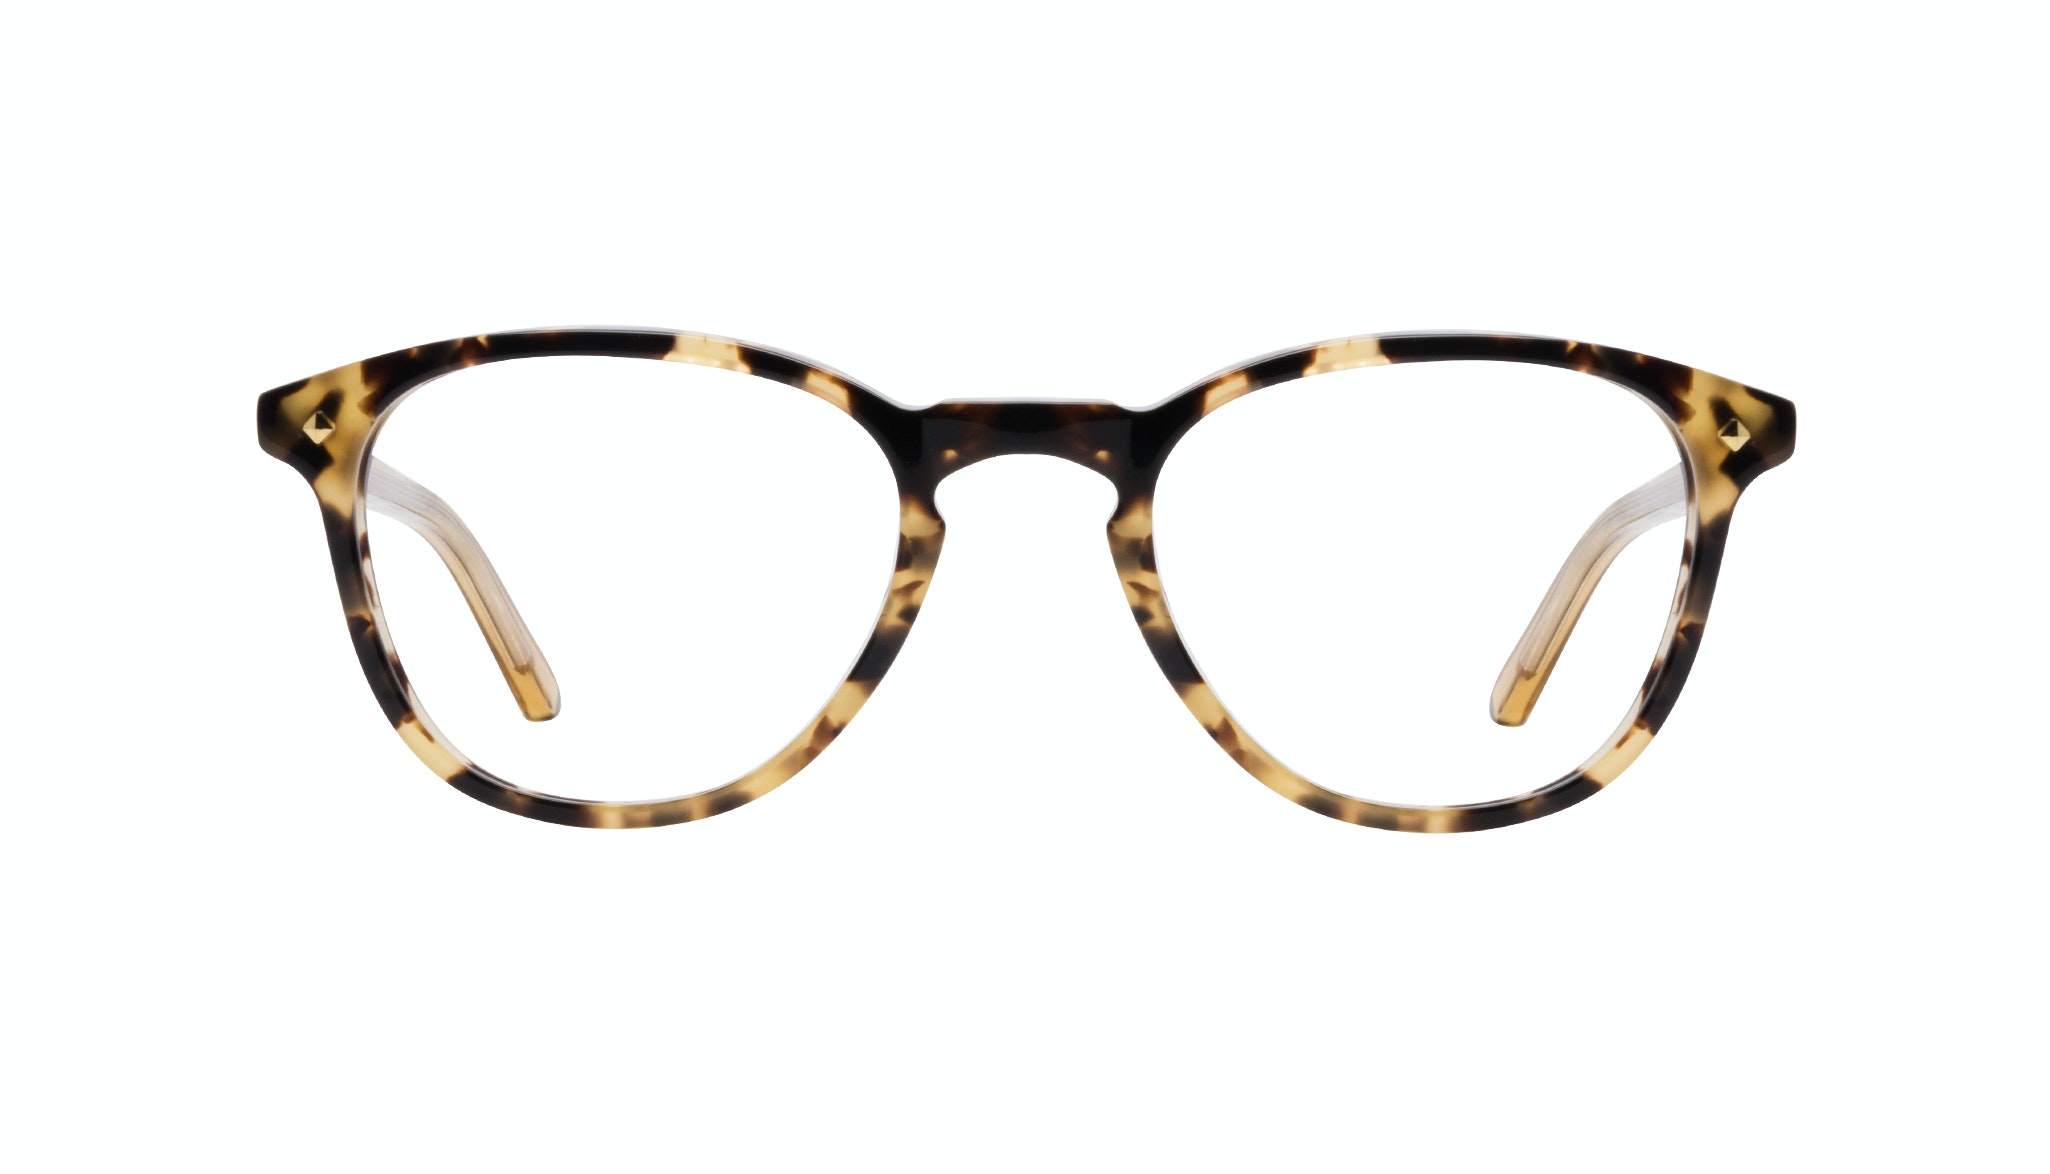 Affordable Fashion Glasses Round Eyeglasses Women Crush Bingal